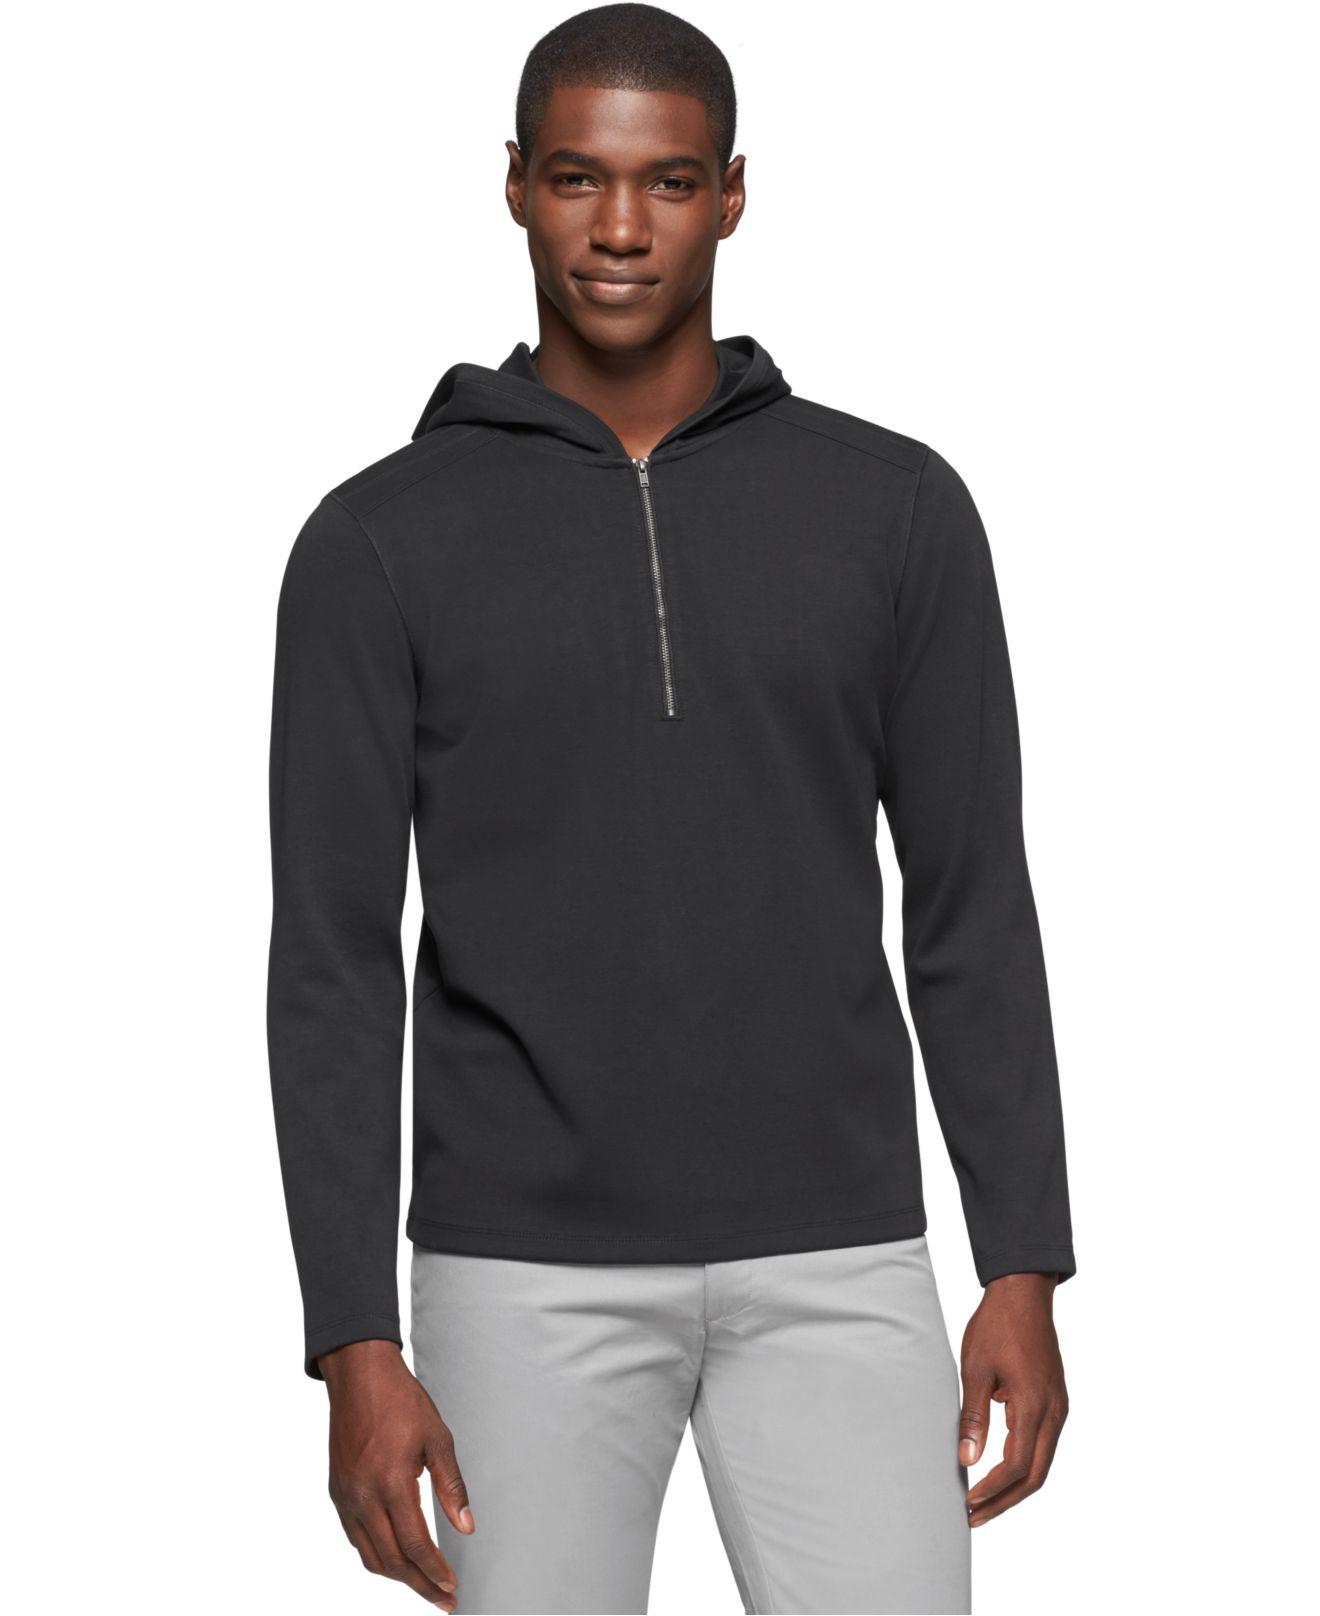 calvin klein quarter zip hoodie in black for men lyst. Black Bedroom Furniture Sets. Home Design Ideas